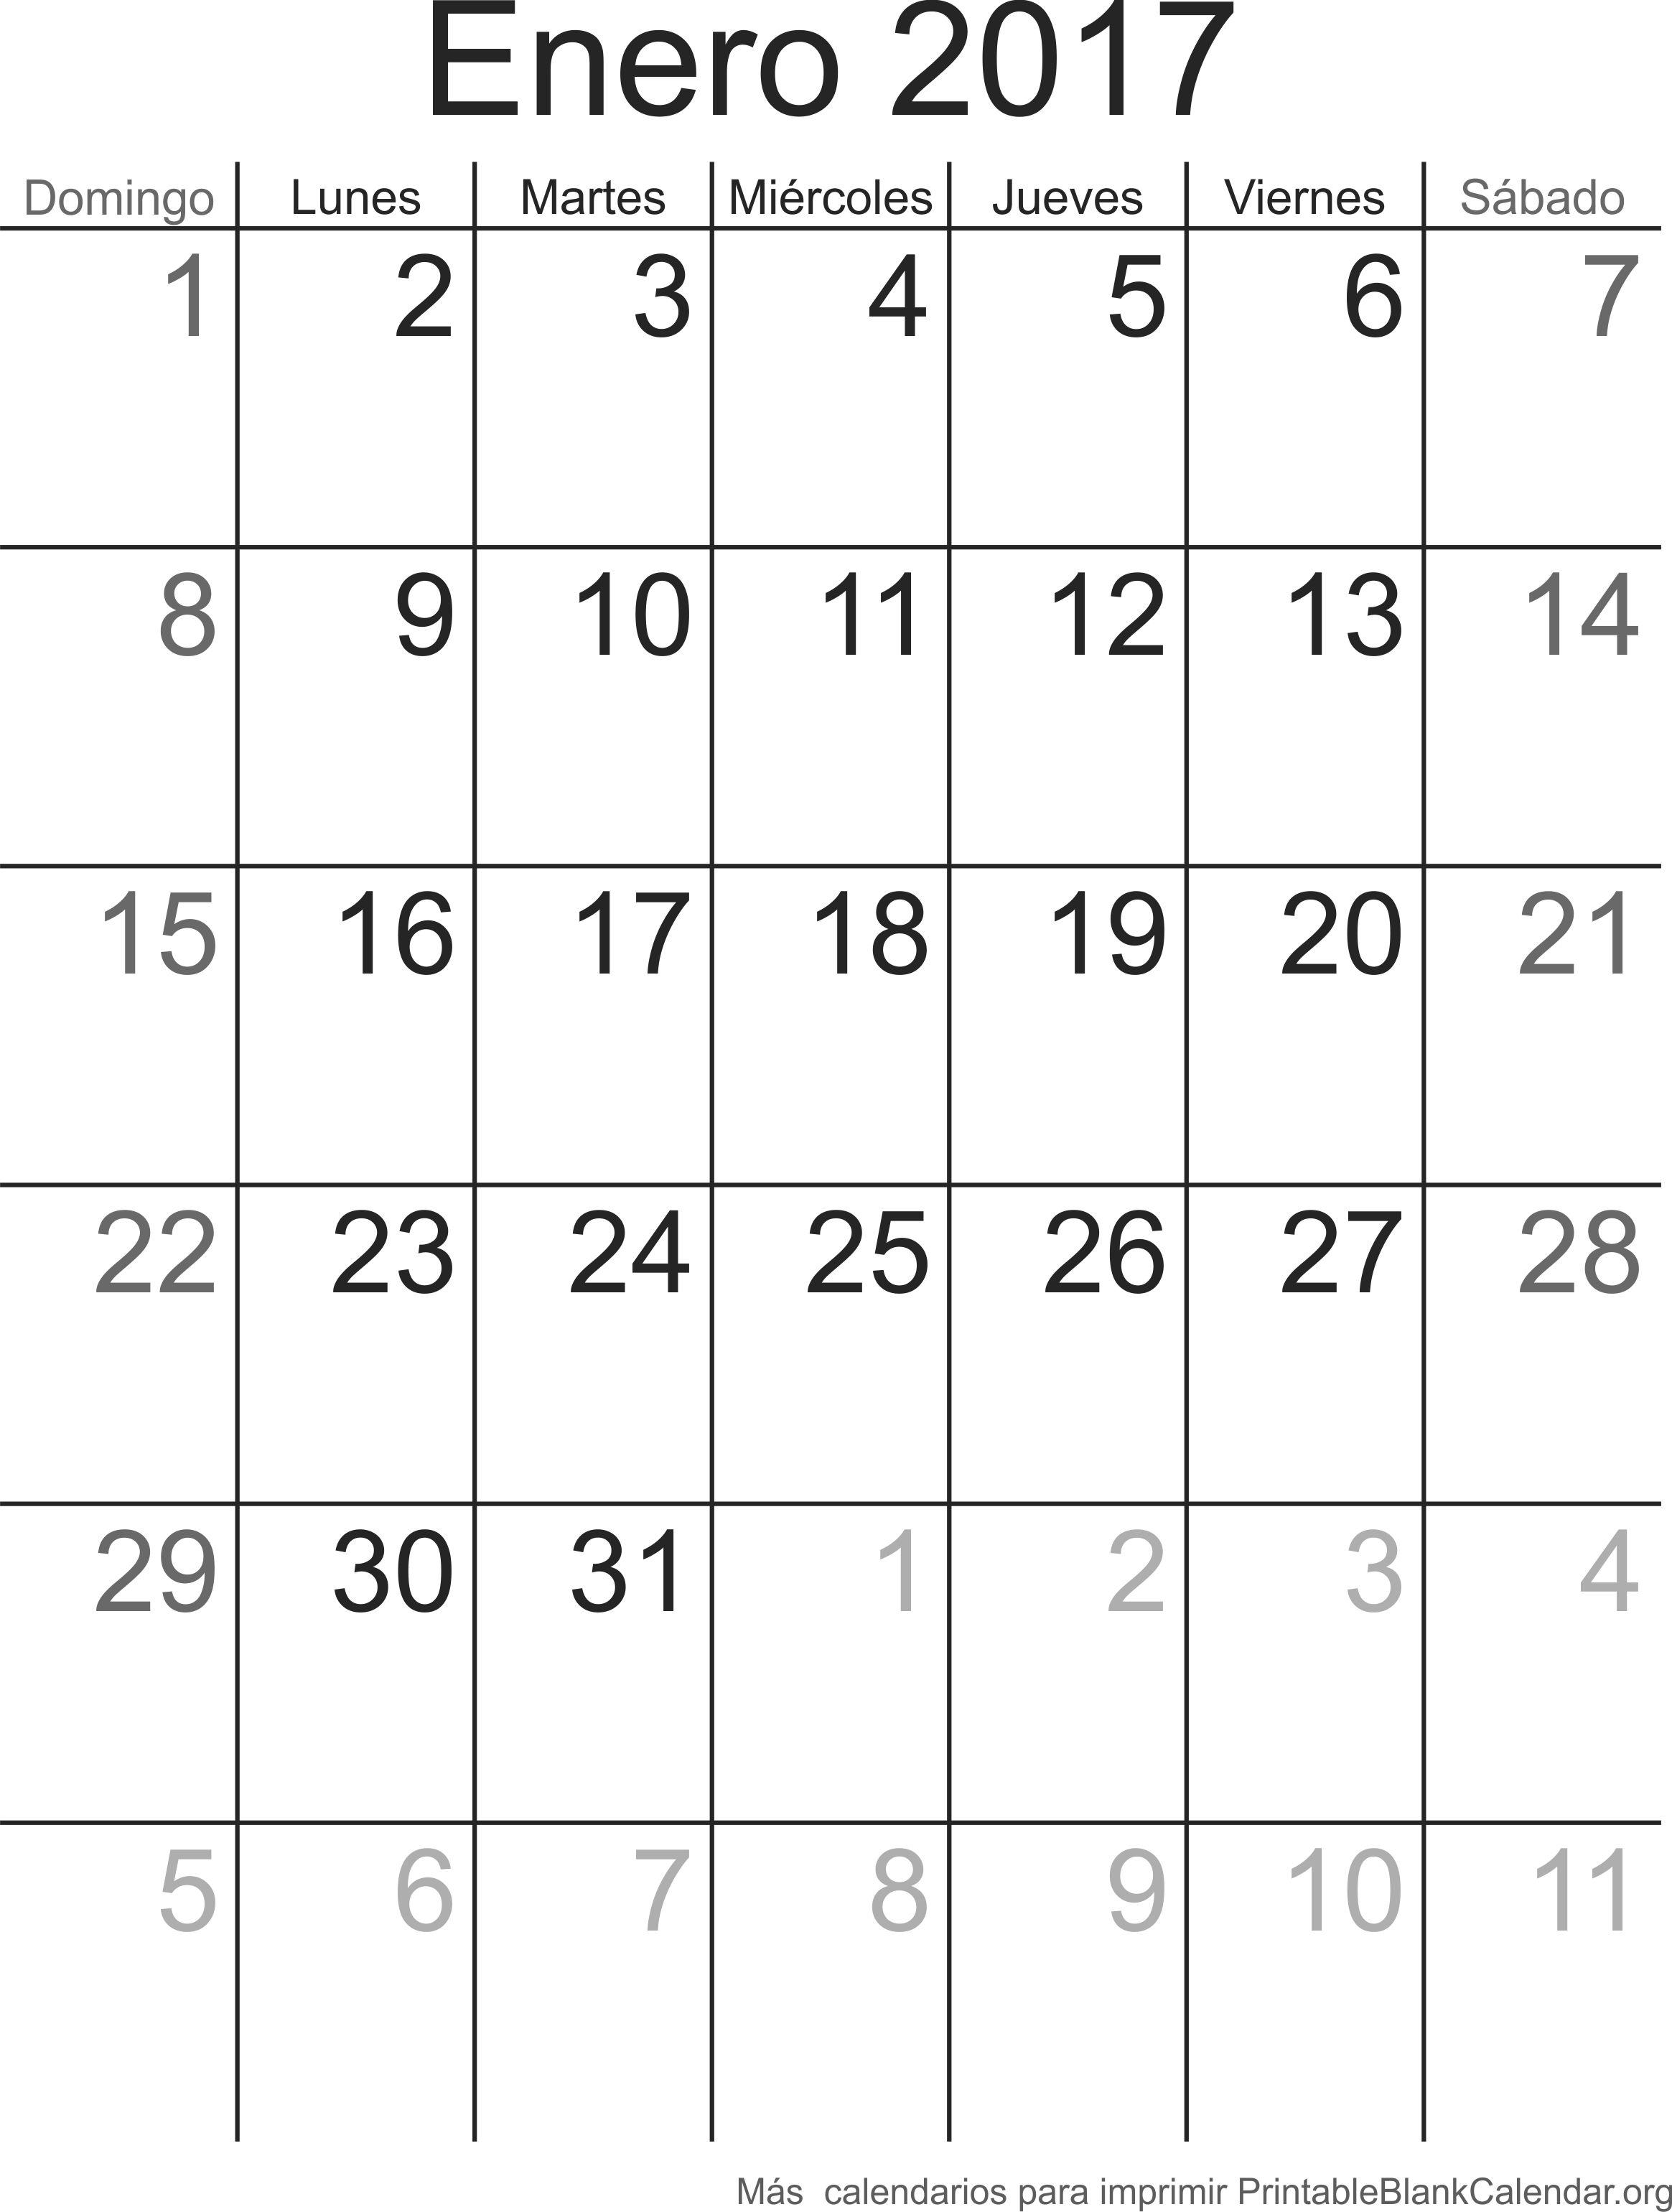 calendario para imprimir ener 2017